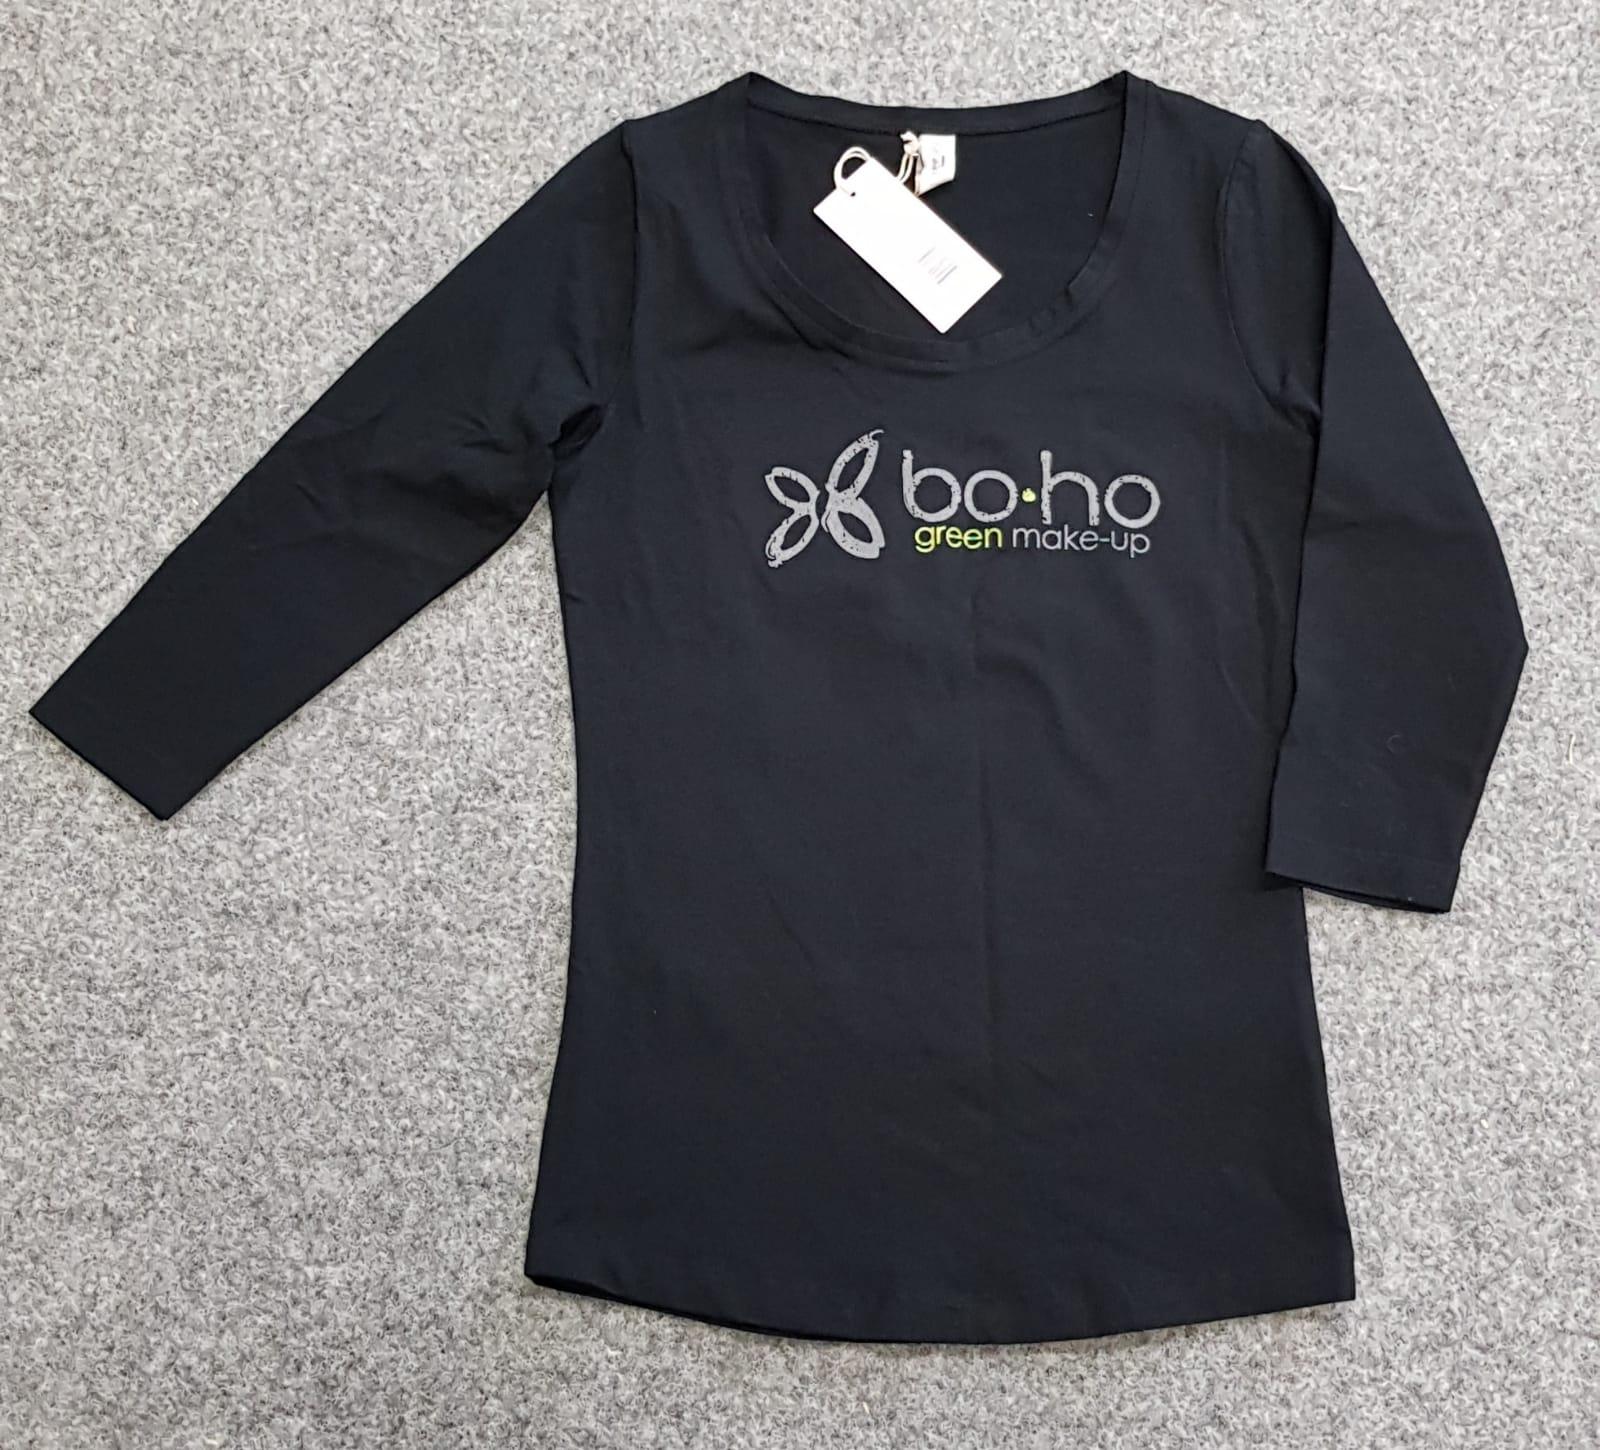 BOHO PAITA Slim FIT - 3/4 hiha, Logo edessä ja takana